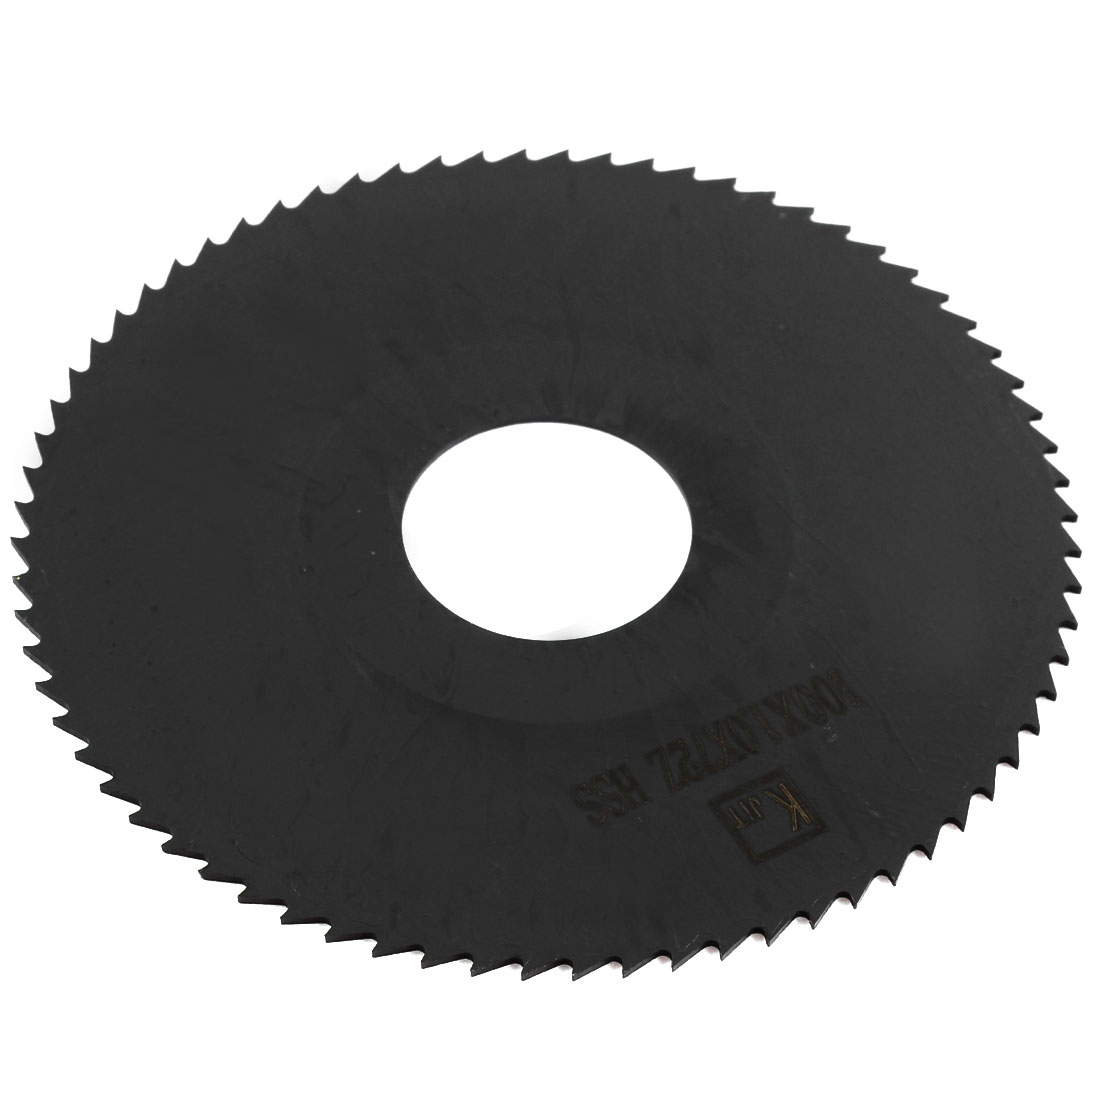 Black HSS 72 Teeth 100mm Dia 1mm Thickness Milling Cutter Slitting Saw